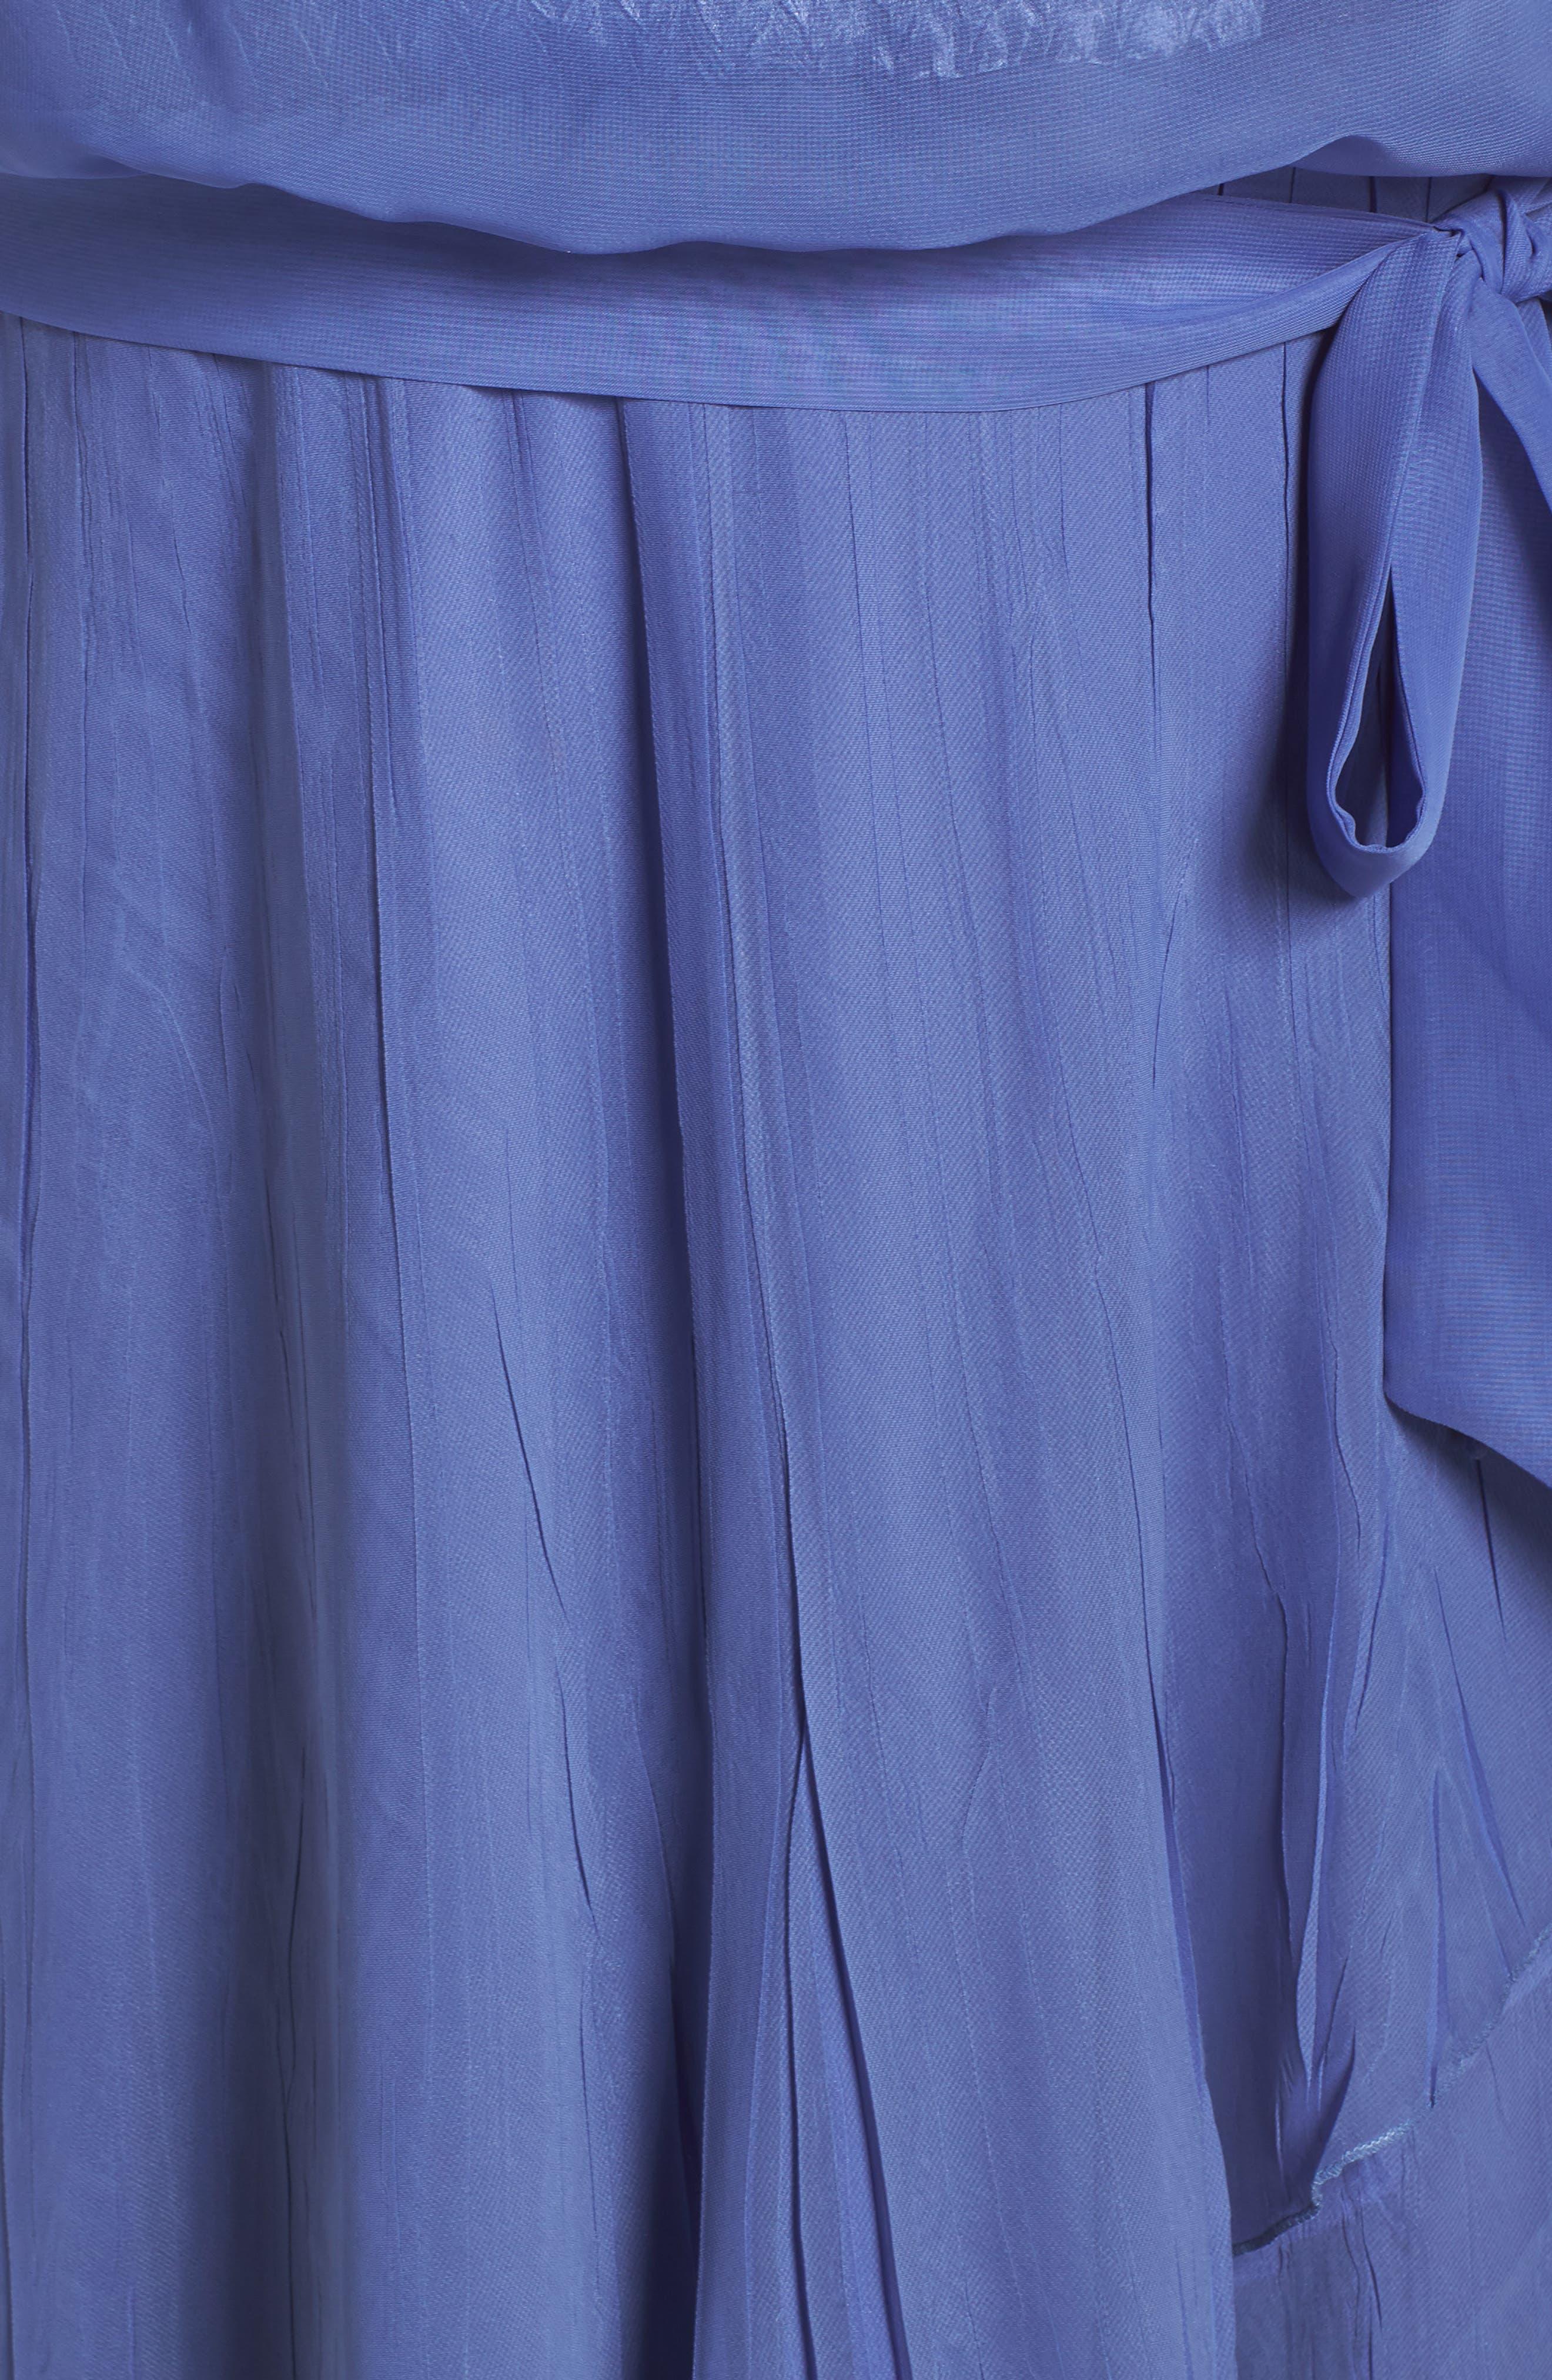 Charmeuse & Chiffon Blouson Dress,                             Alternate thumbnail 6, color,                             Fregatta Blue Ombre